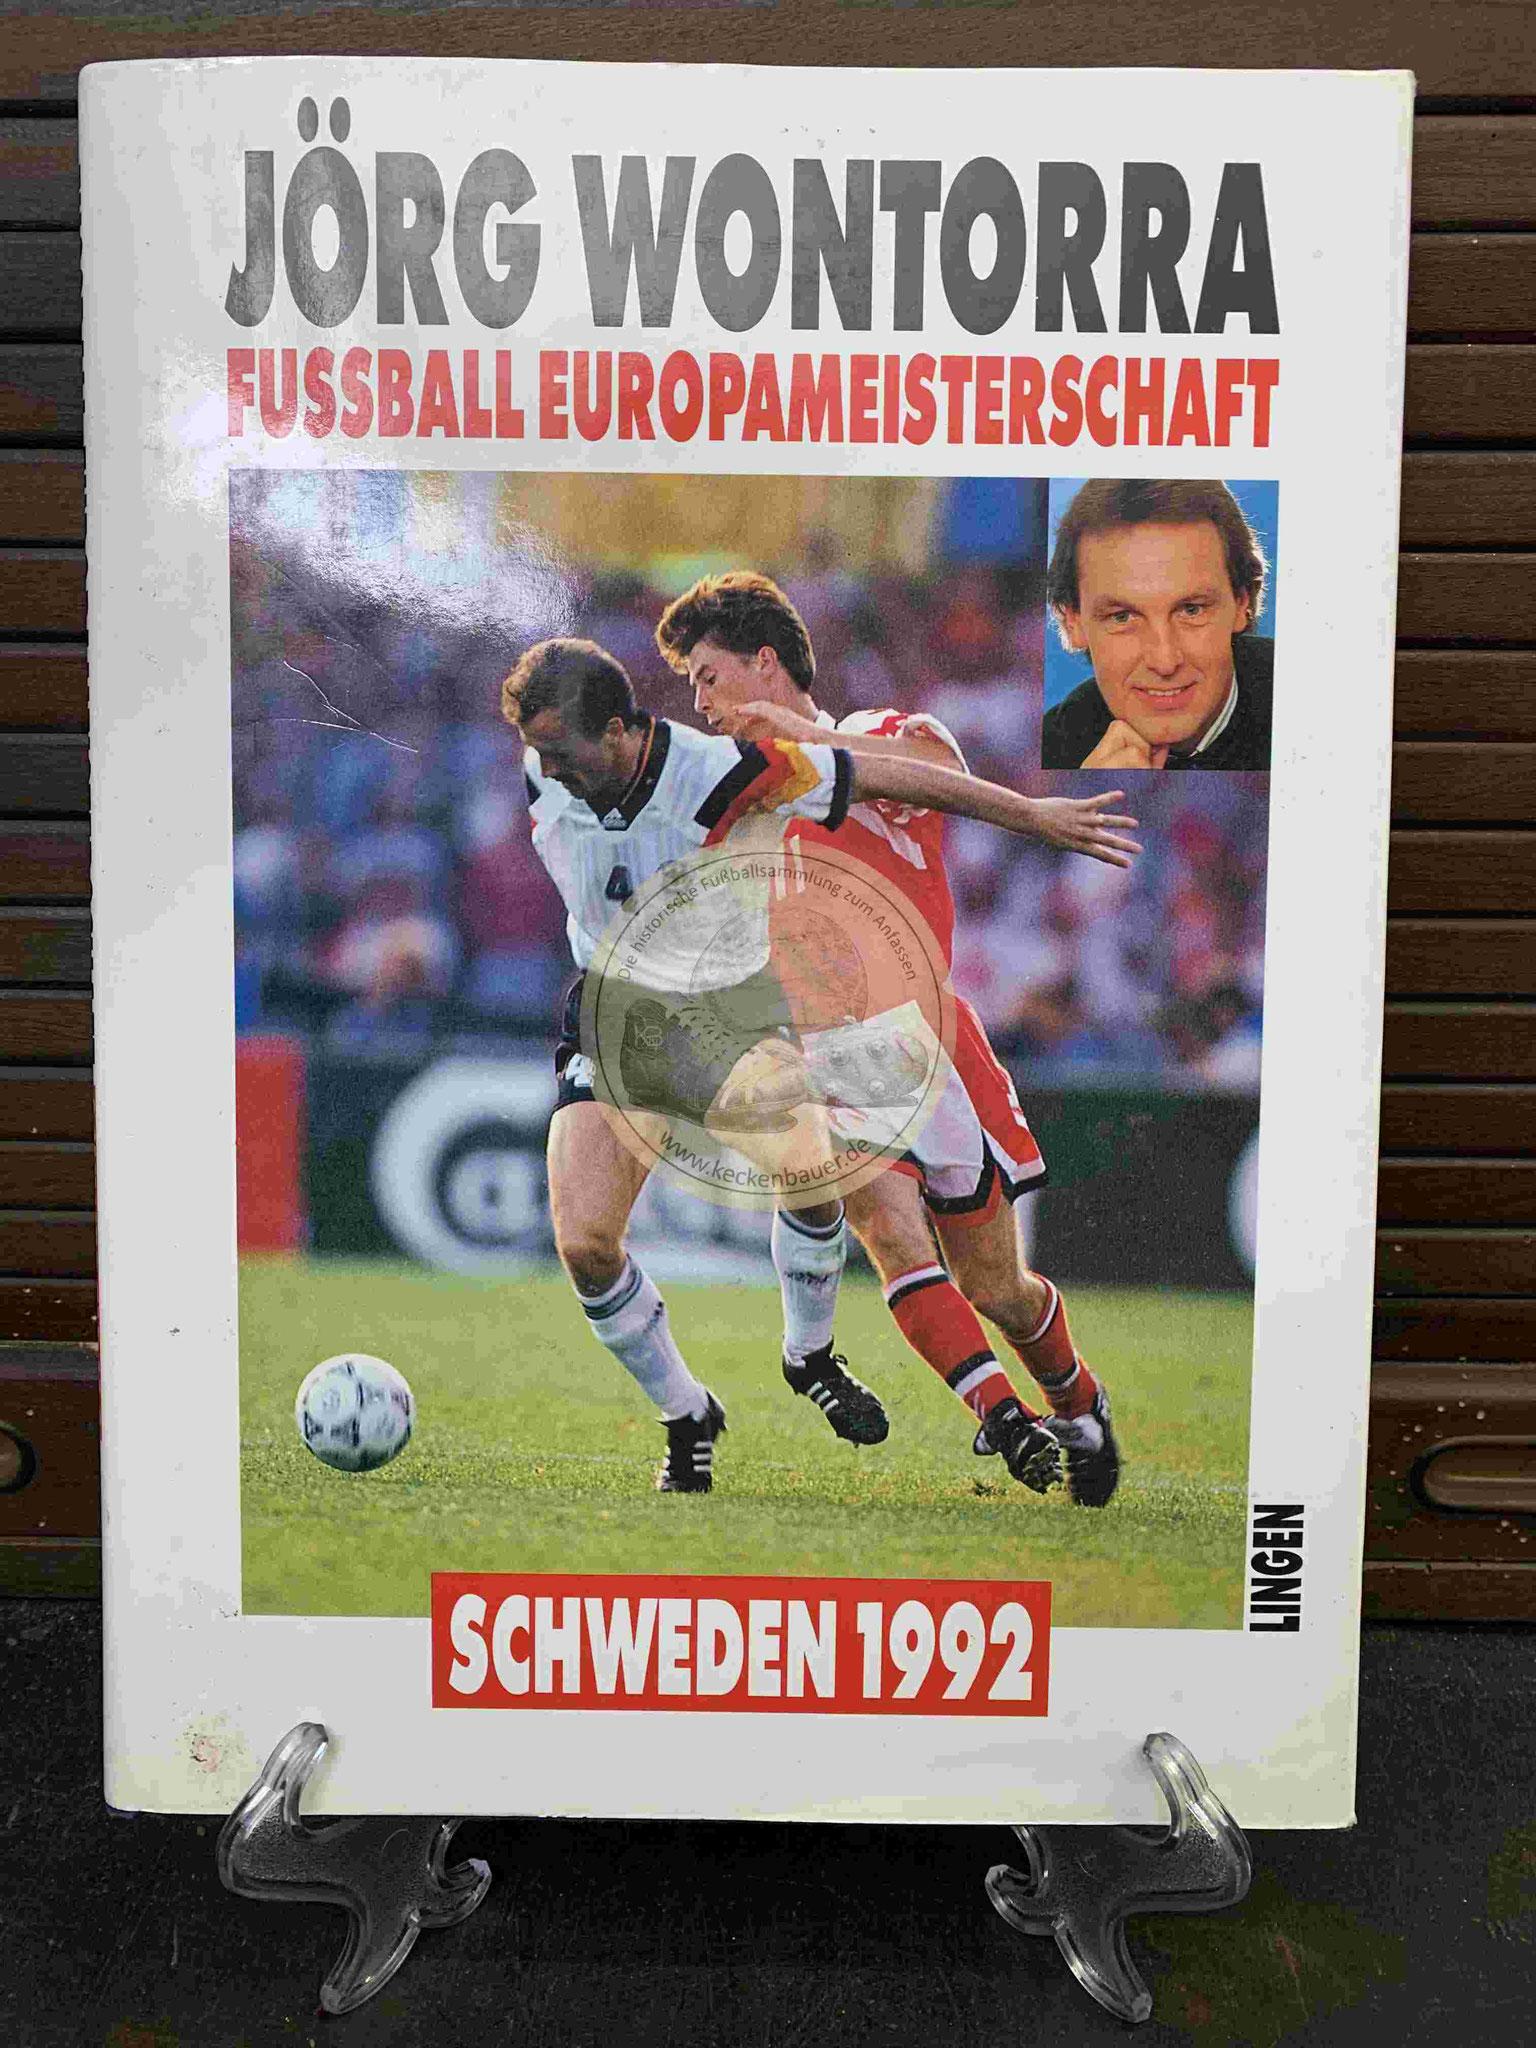 Jörg Wontorra Fußball Europameisterschaft Schweden 1992 vom Lingen Verlag